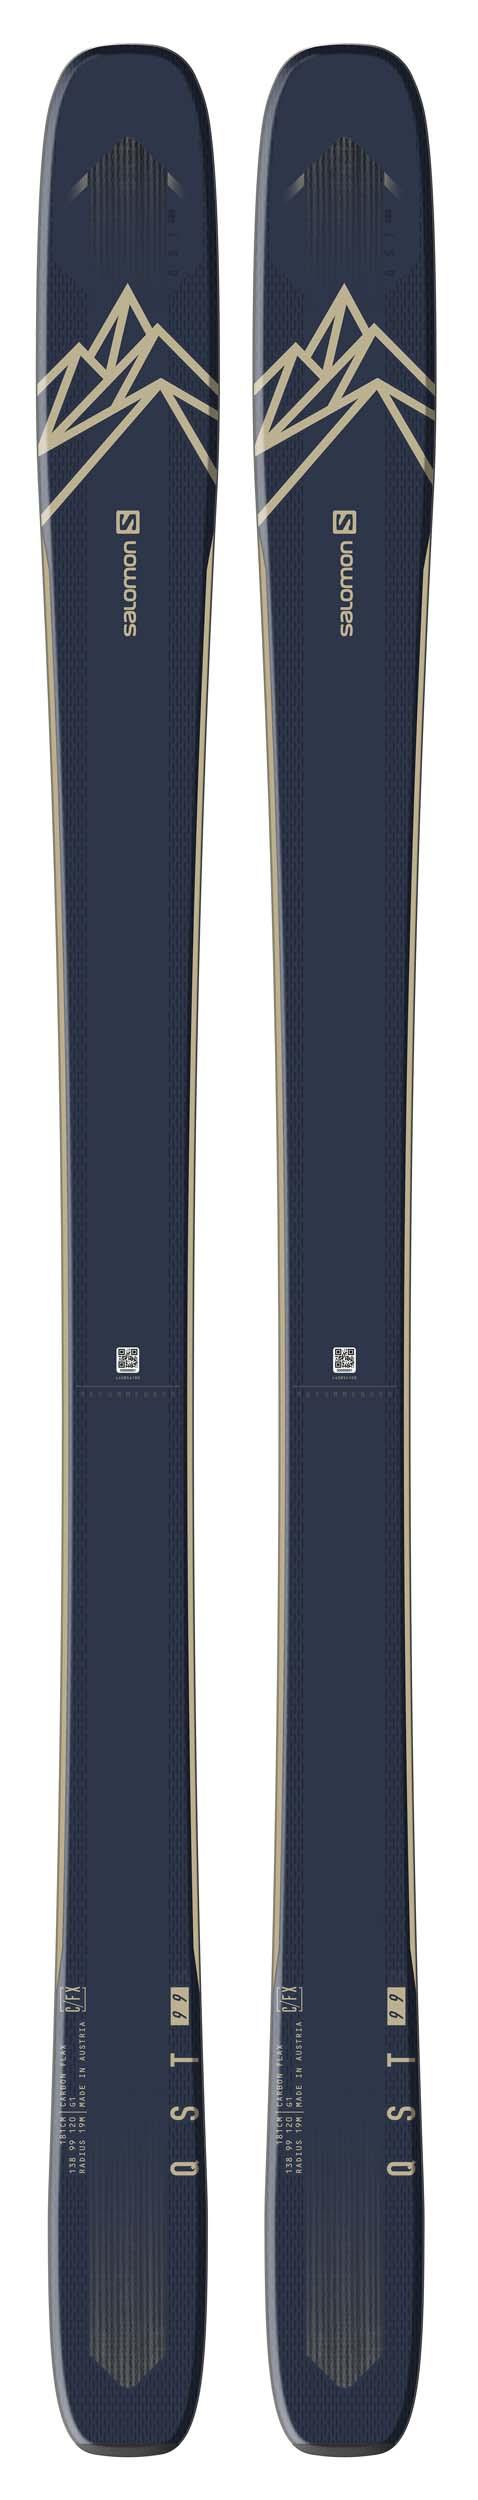 Salomon 2021 QST 99 Skis (Without Bindings / Flat) NEW !! 167,174,181,188cm